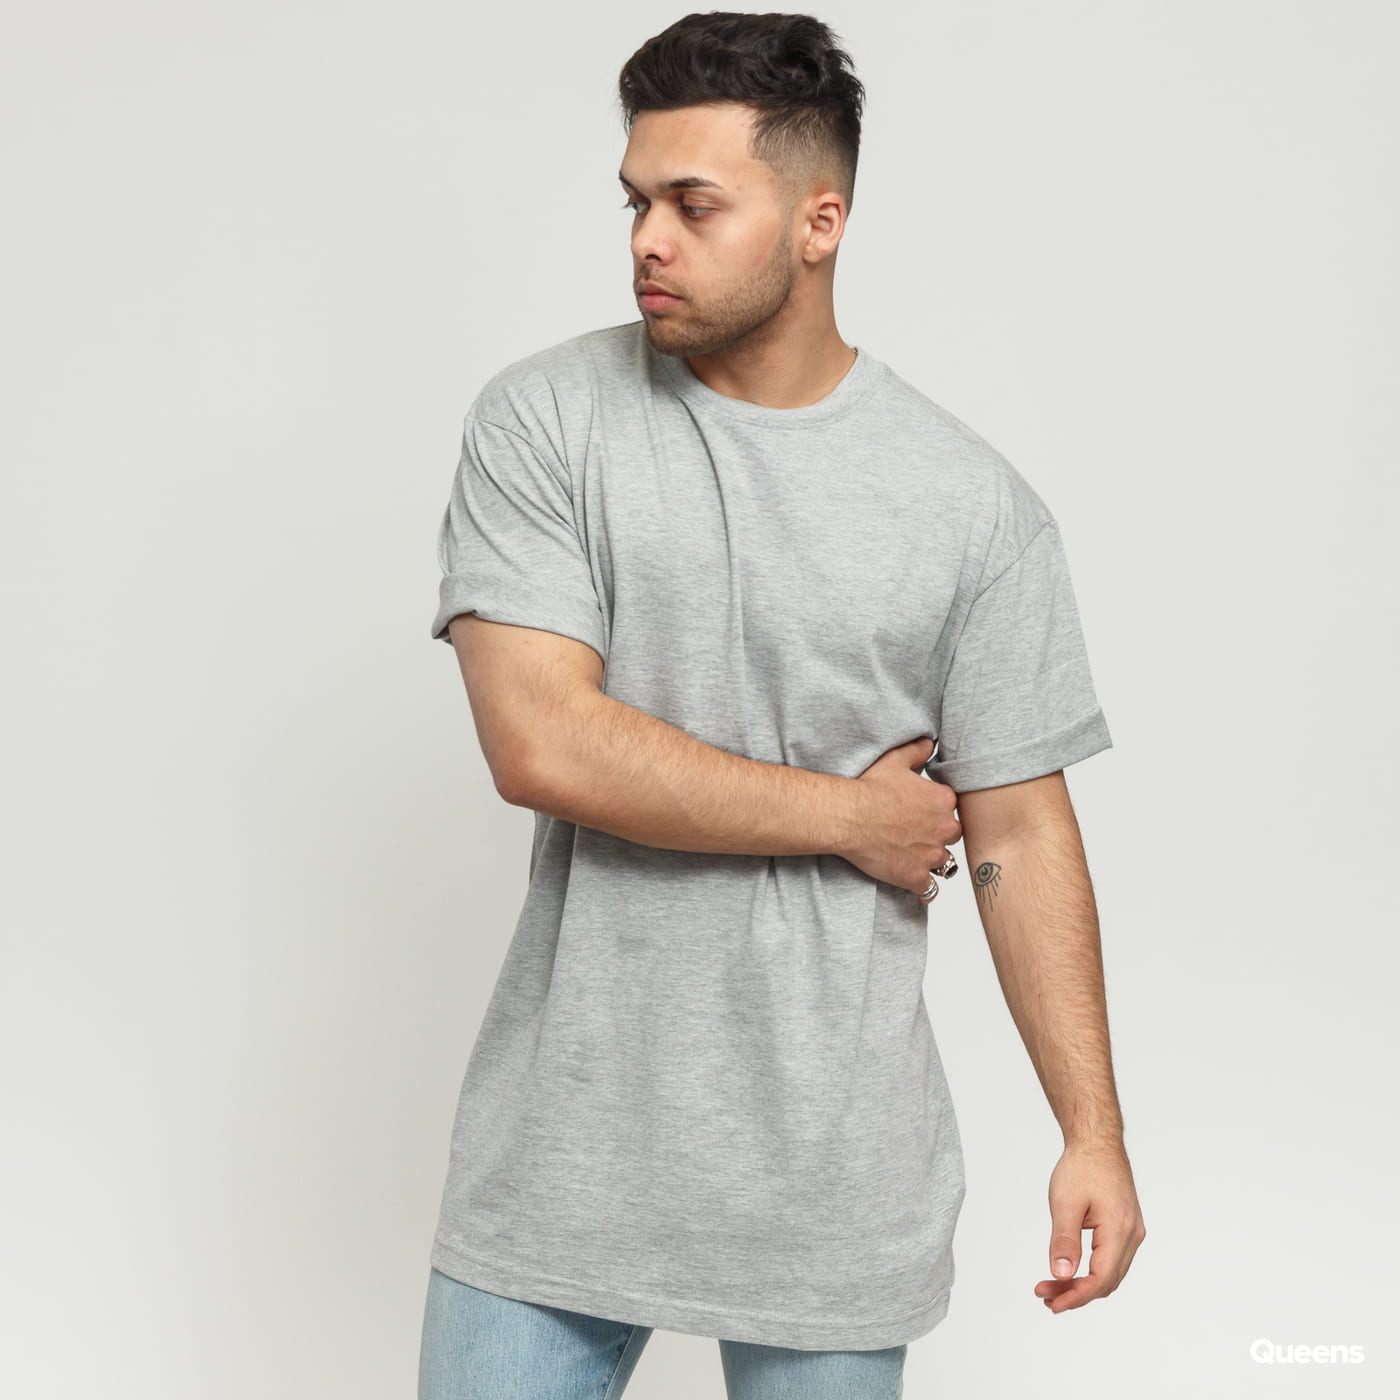 Urban Classics Tall Tee gray